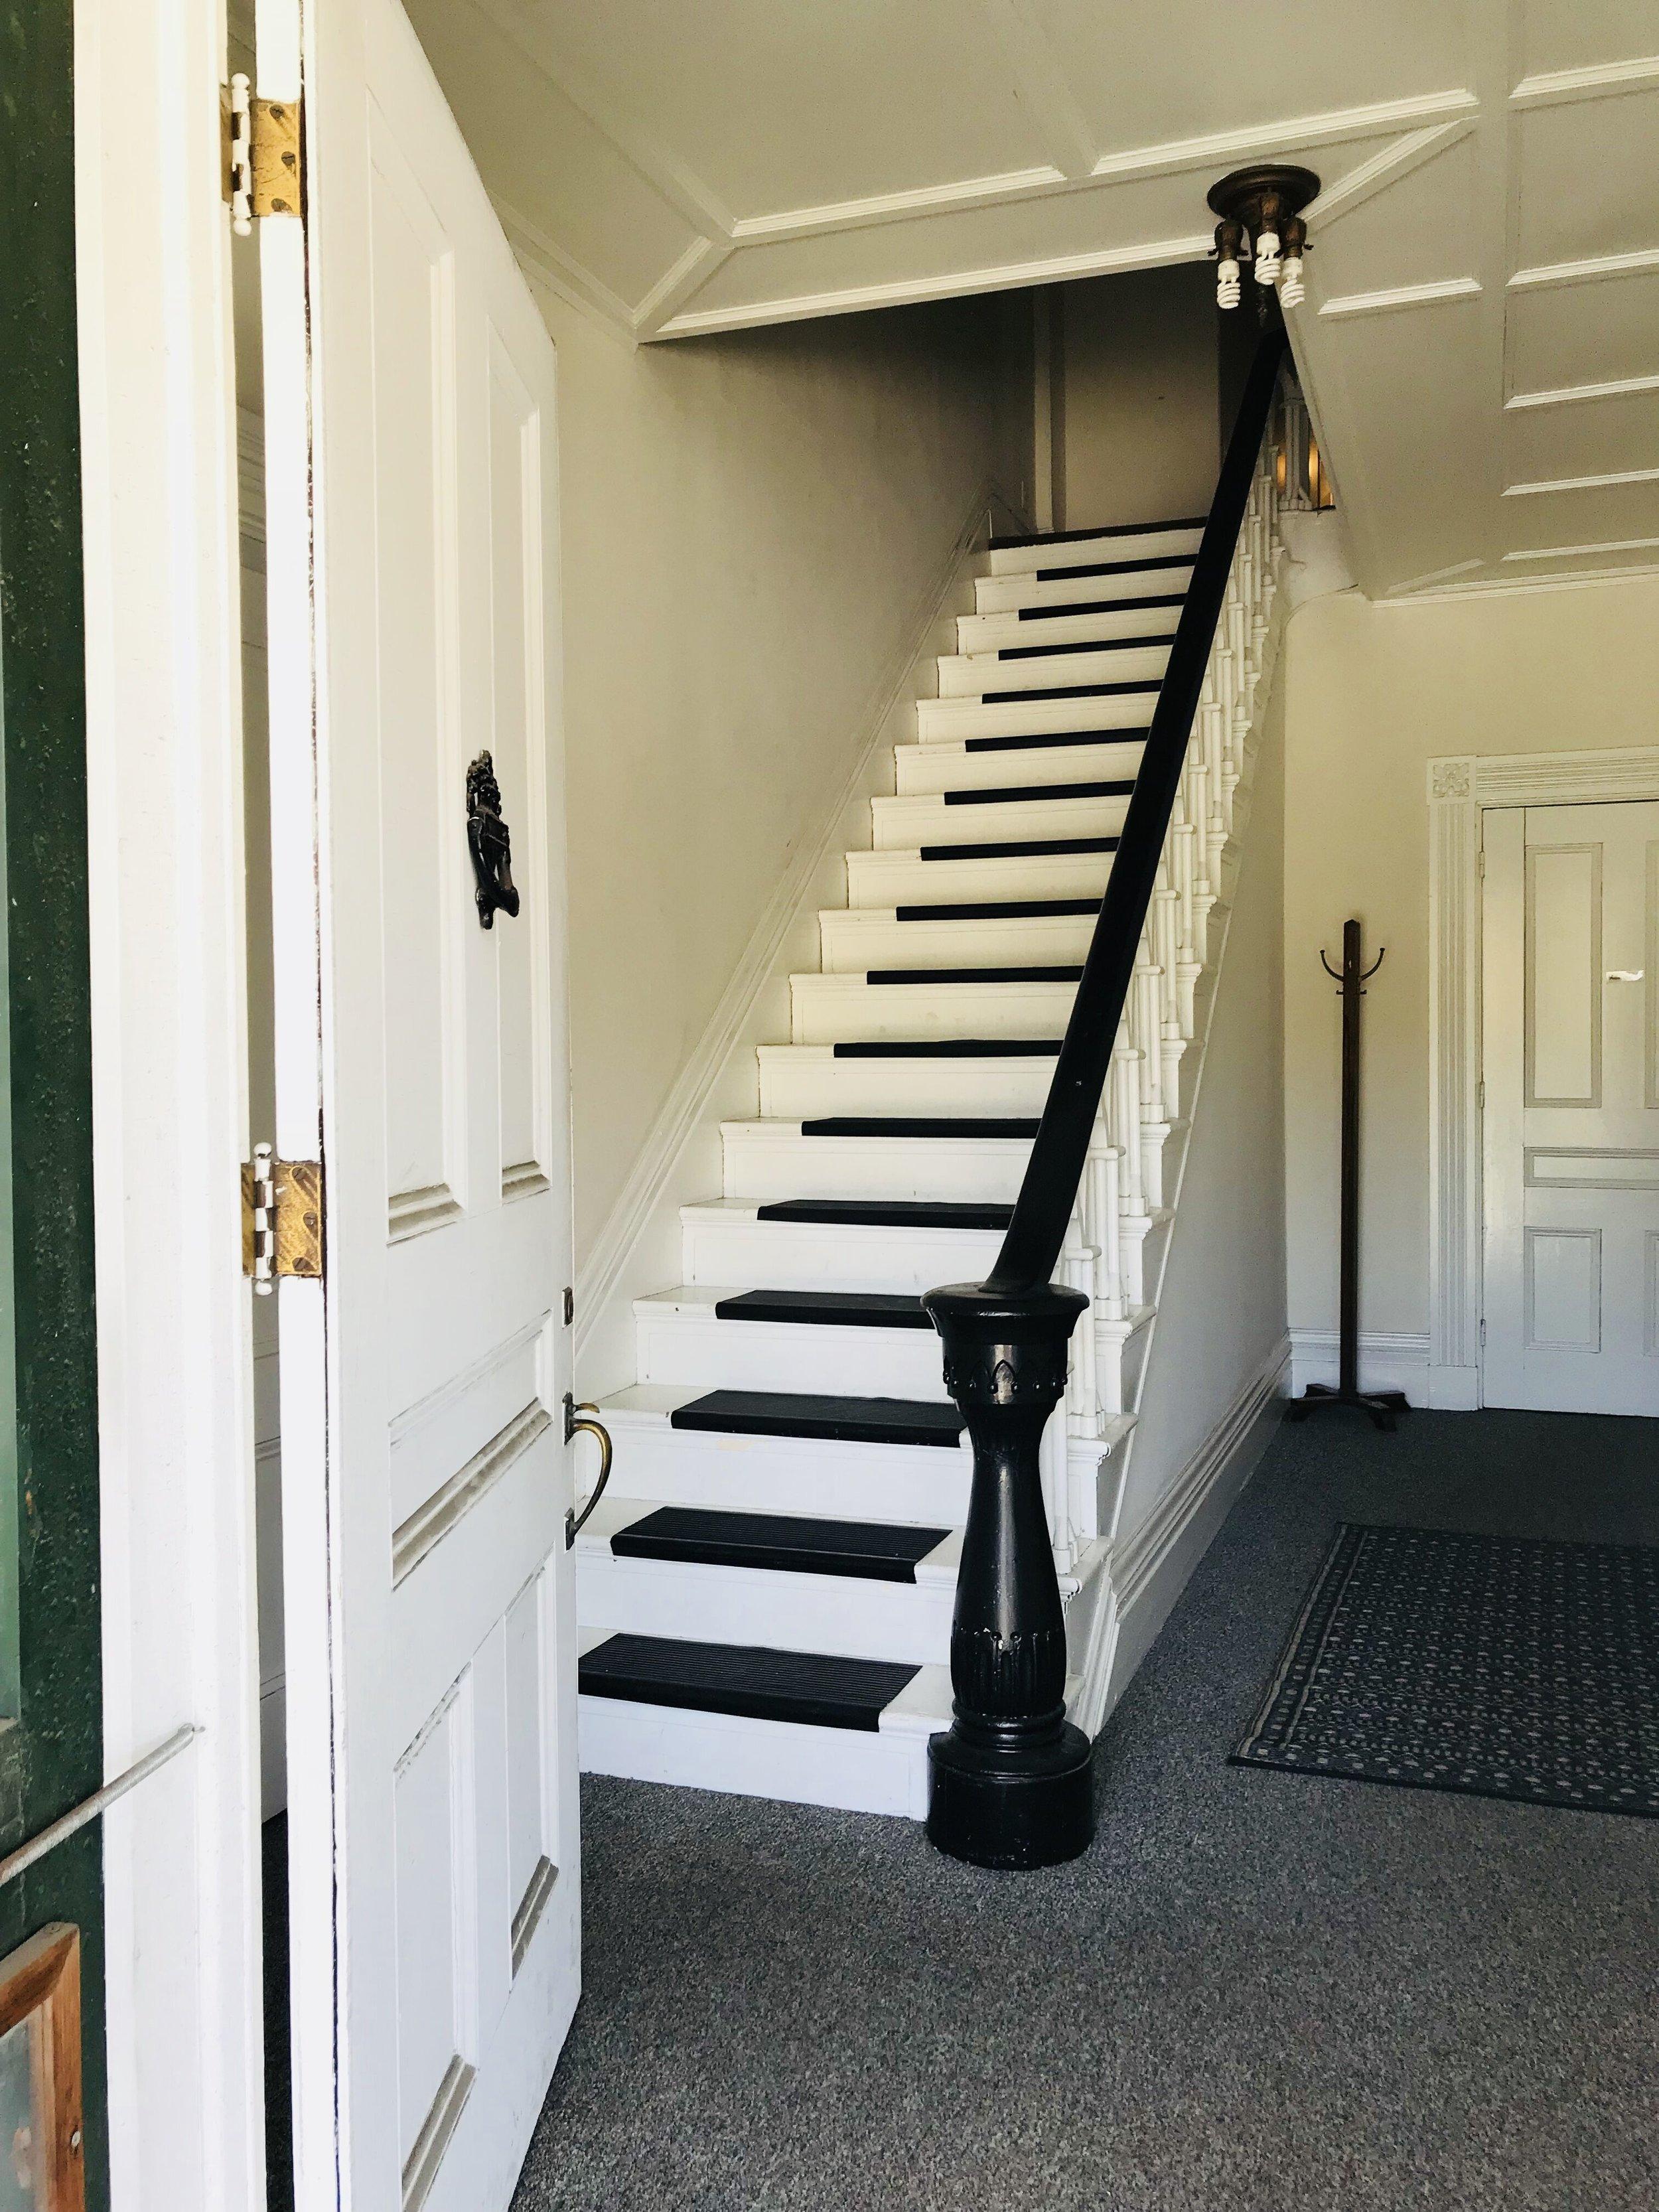 147 Stairs.jpeg